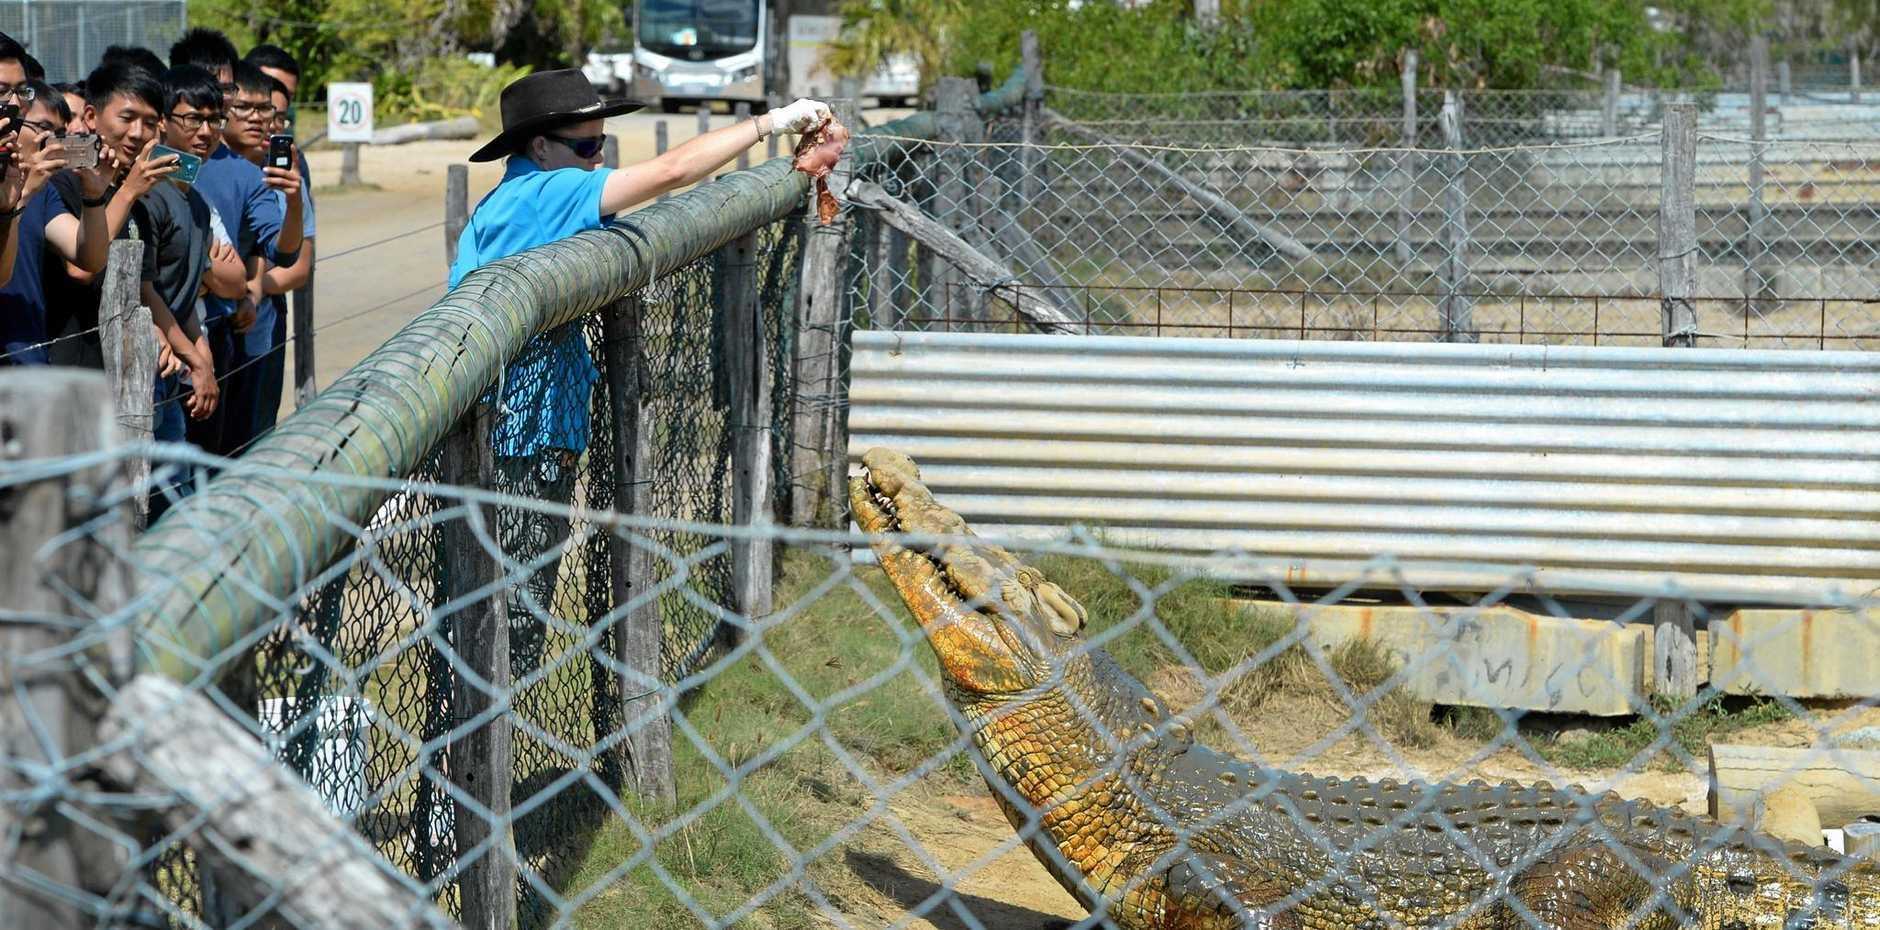 CRACKER CROC: Amanda Carolan feeds one of the crocodiles at the Koorana Crocodile Farm for Singaporean soldiers in Rockhampton for Exercise Wallaby.